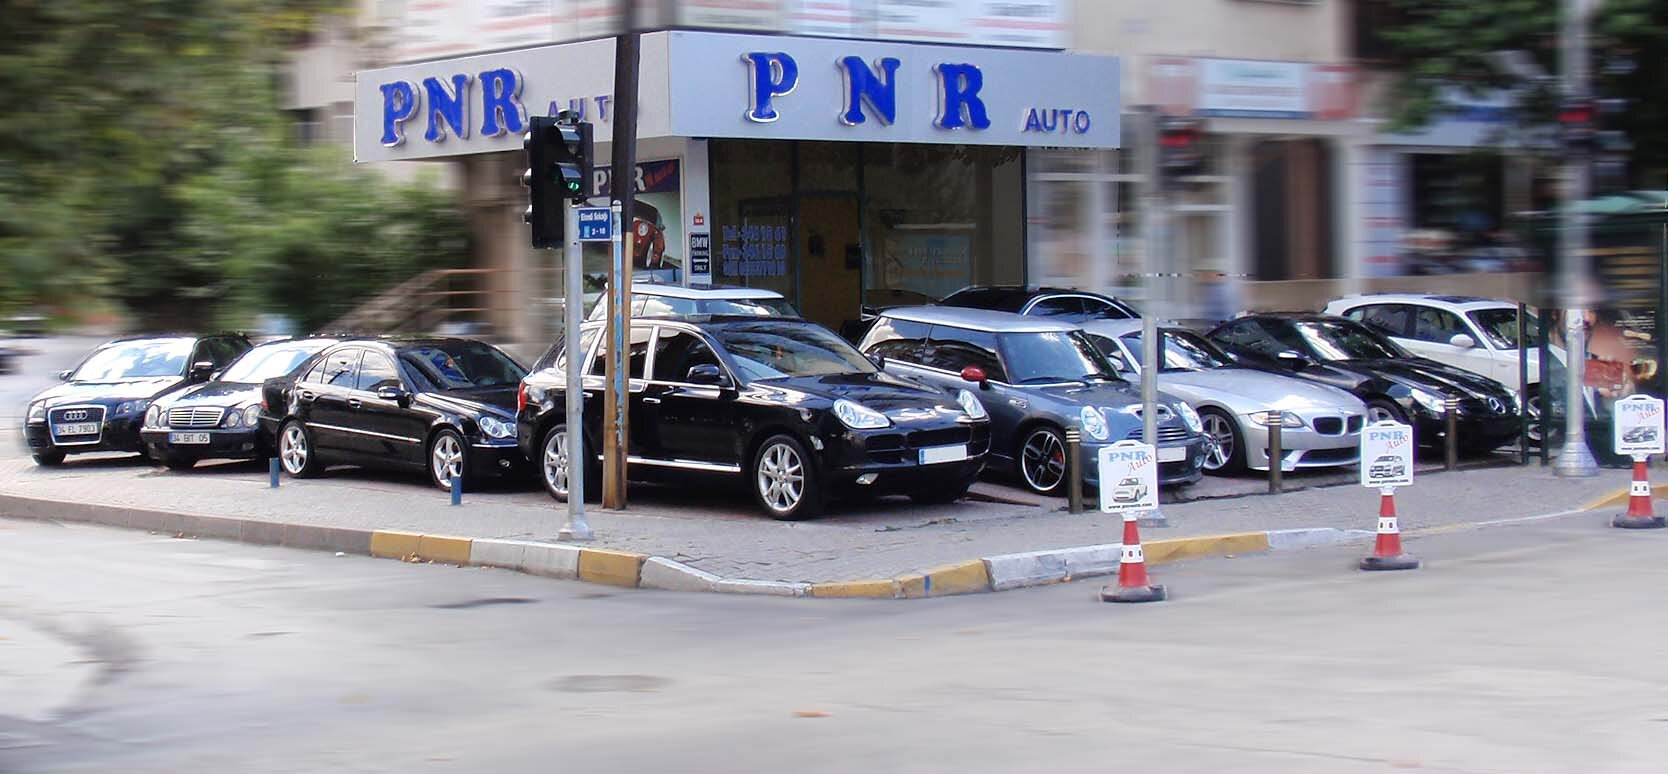 PNR AUTO